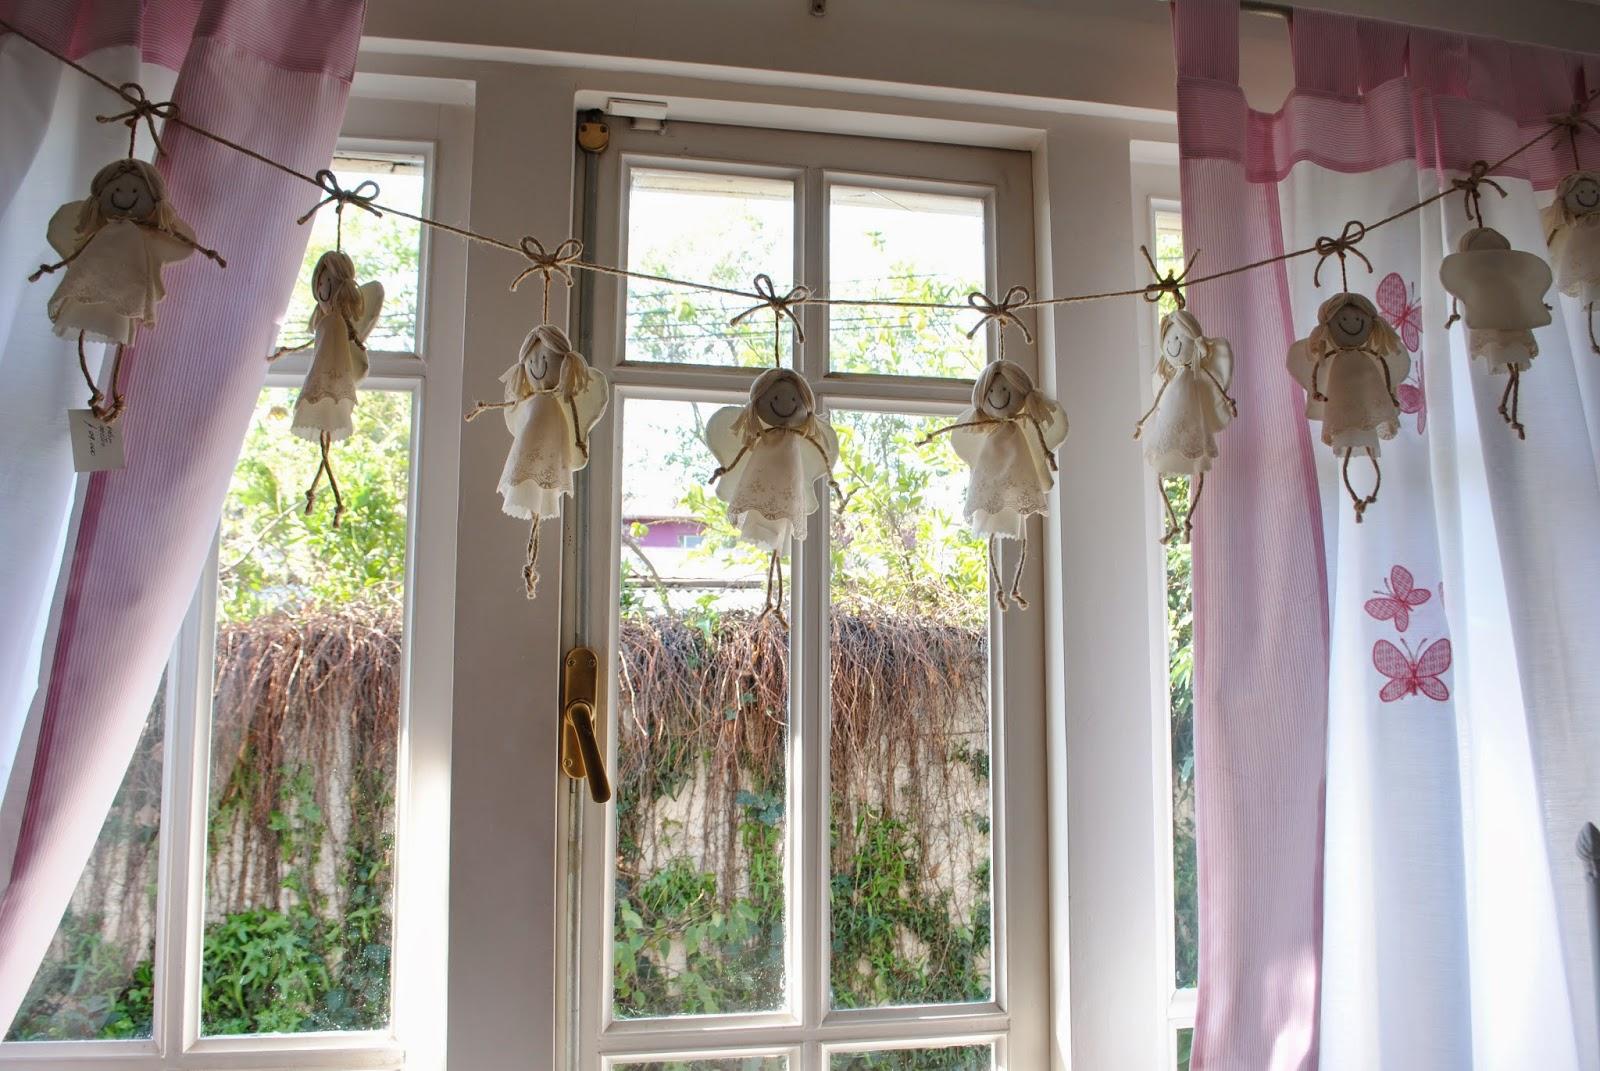 Cortina de ventana - Cortinas para ventanas abuhardilladas ...